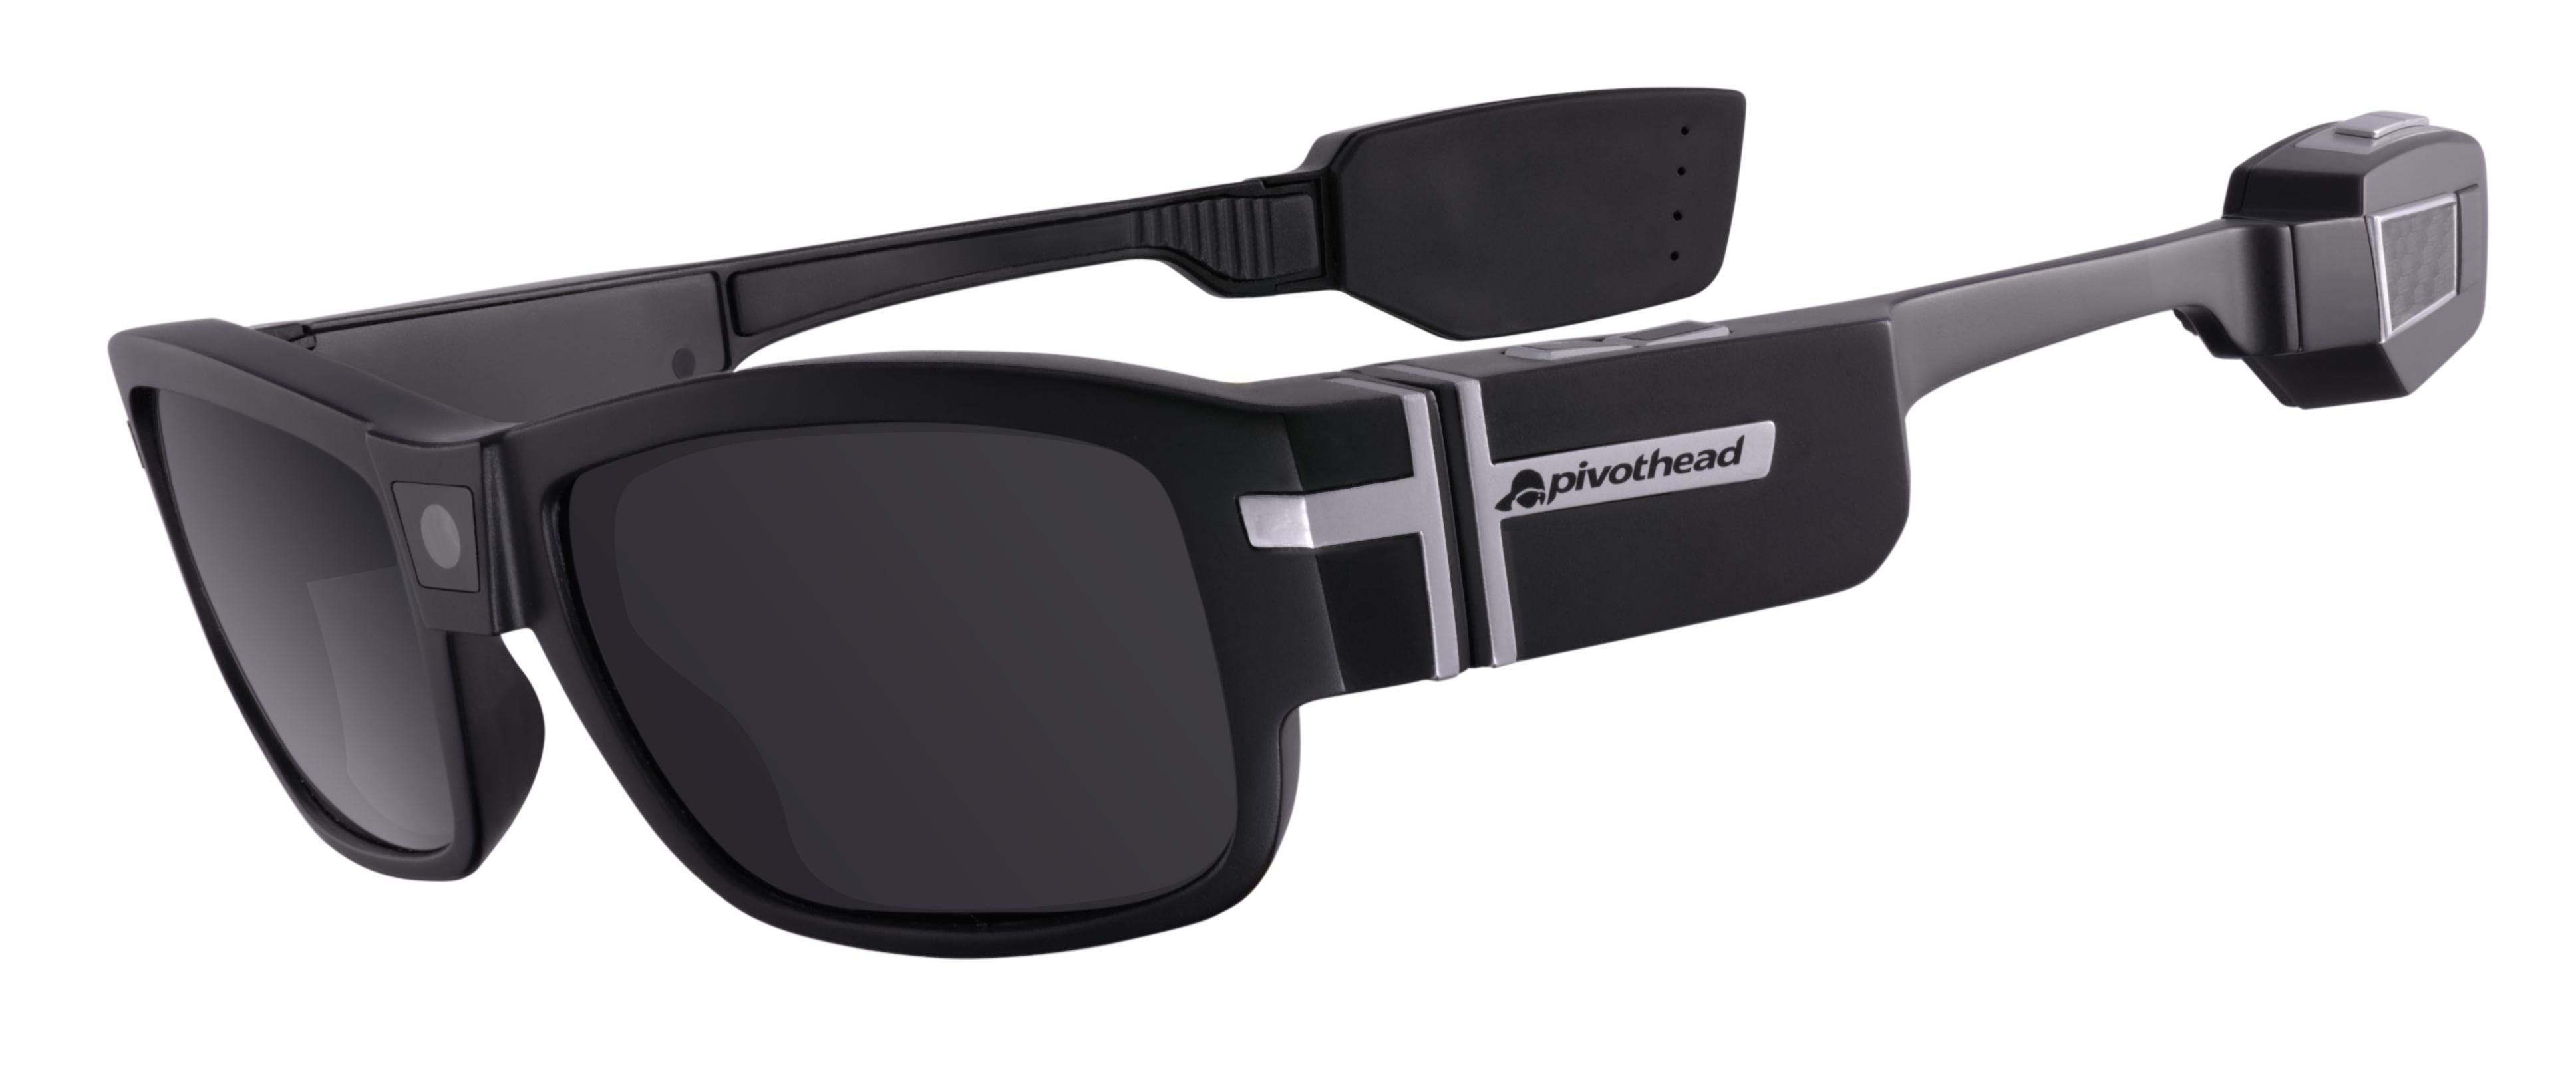 Pivothead SMART Glasses. Teller Model. (Photo: Business Wire)